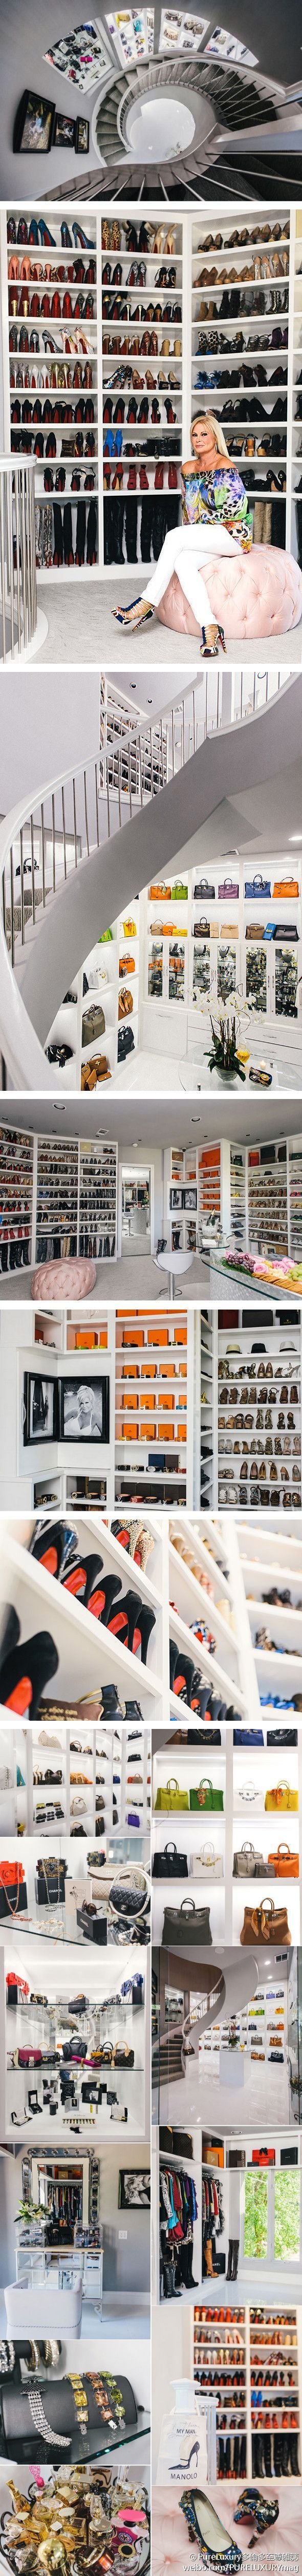 Theresa Roemer's Fabulously Luxurious Closet - Pure Luxury Magazine - ShazB - Dream Homes